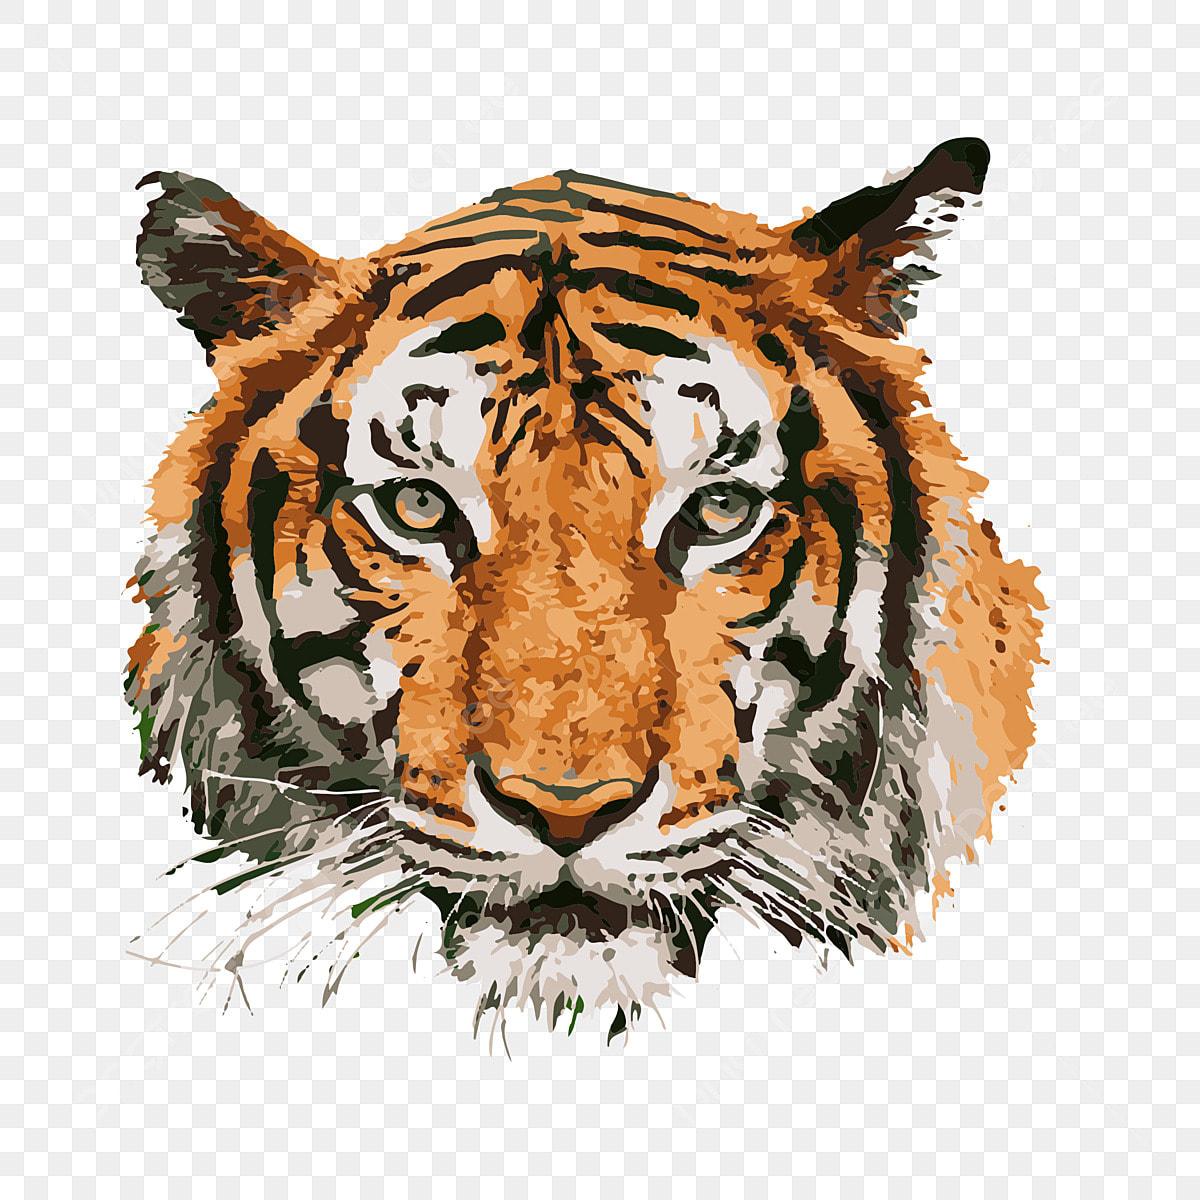 89+ Gambar Awan Harimau HD